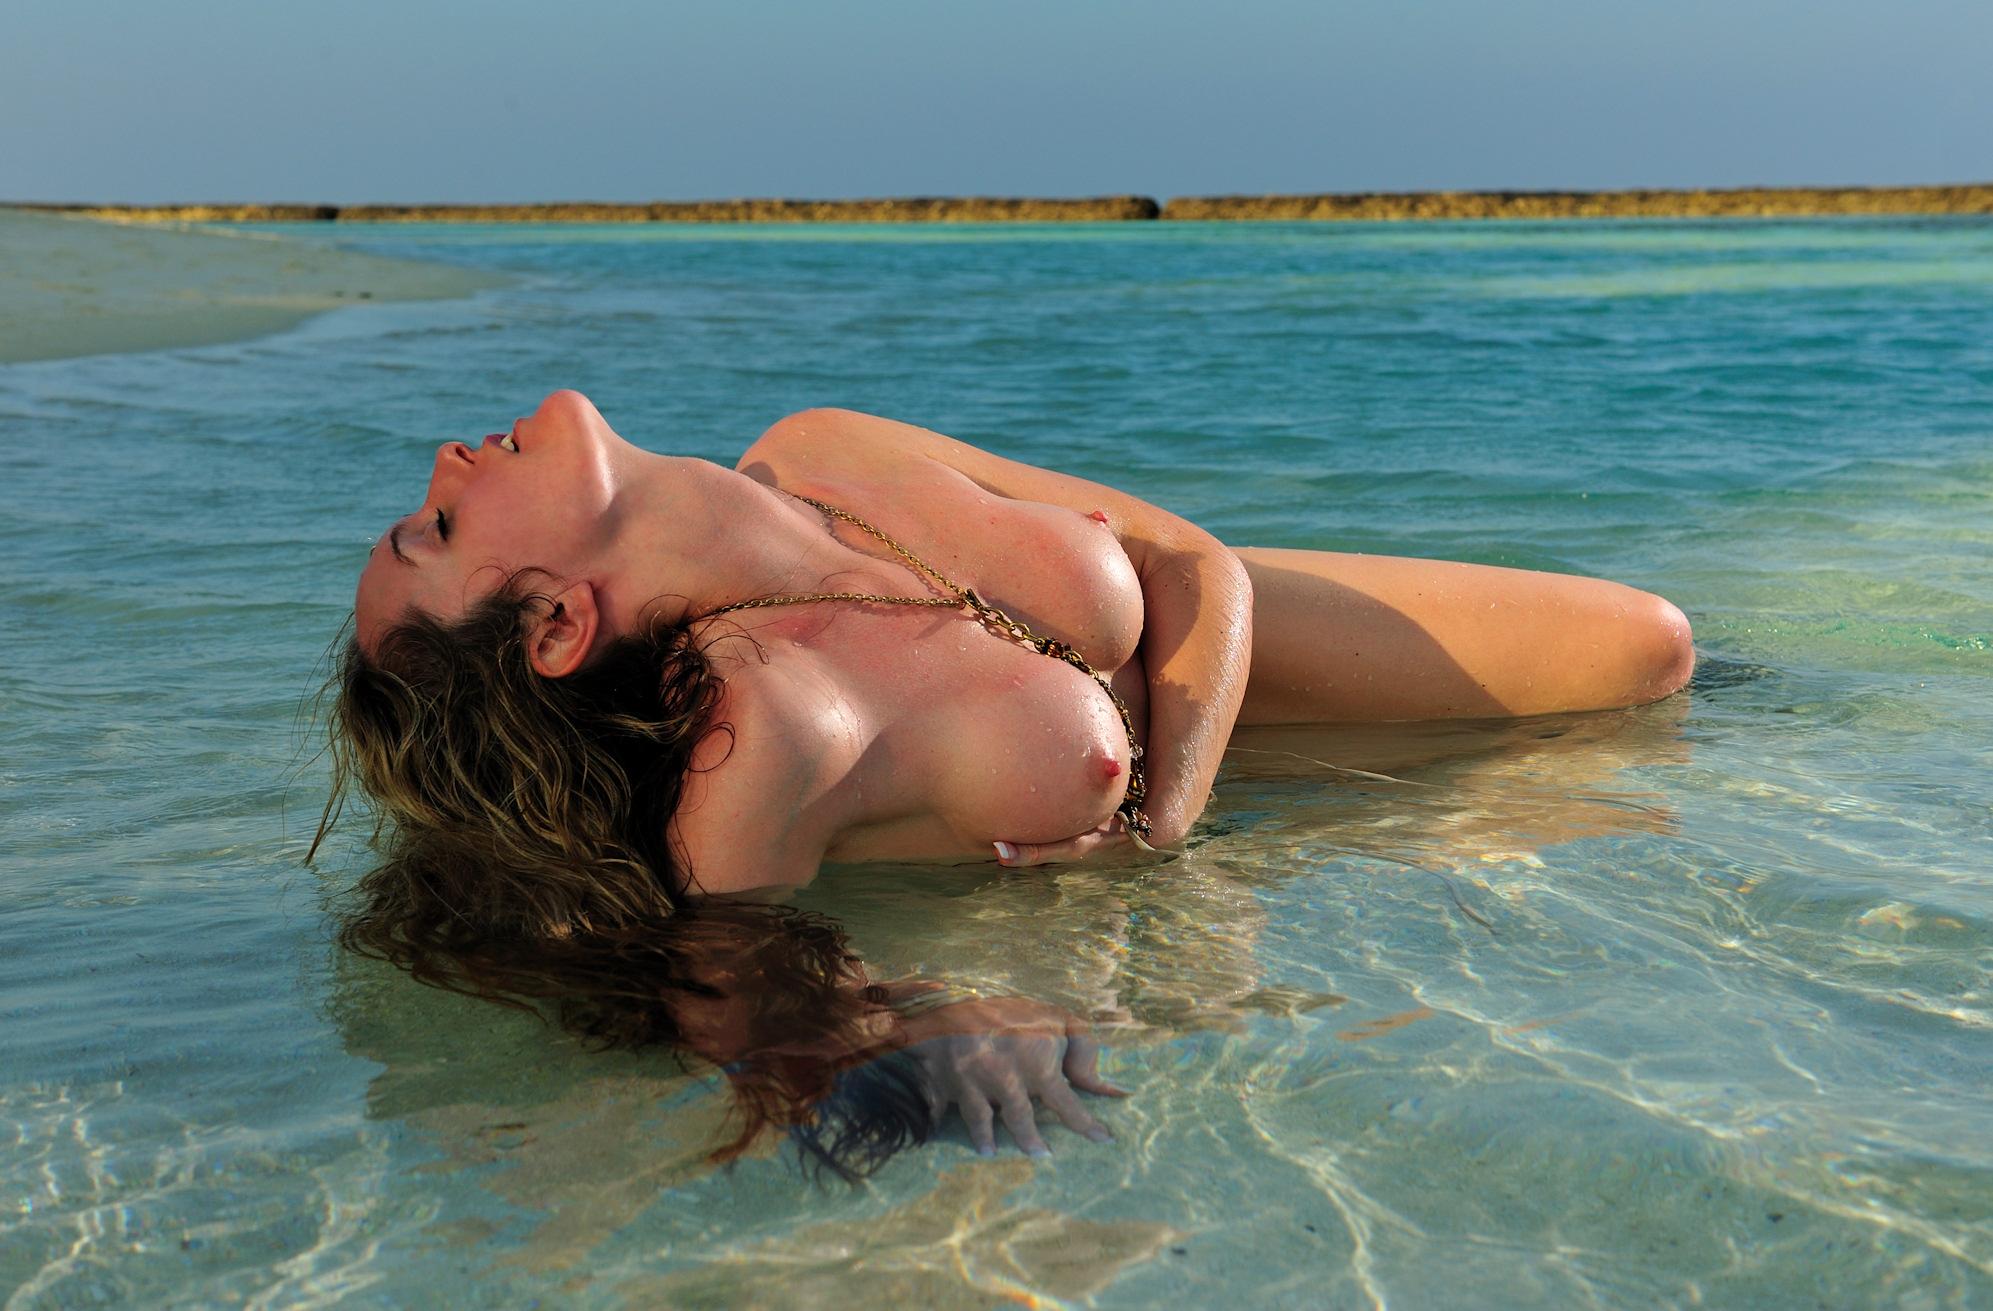 seksi-foto-na-plyazhe-maldiv